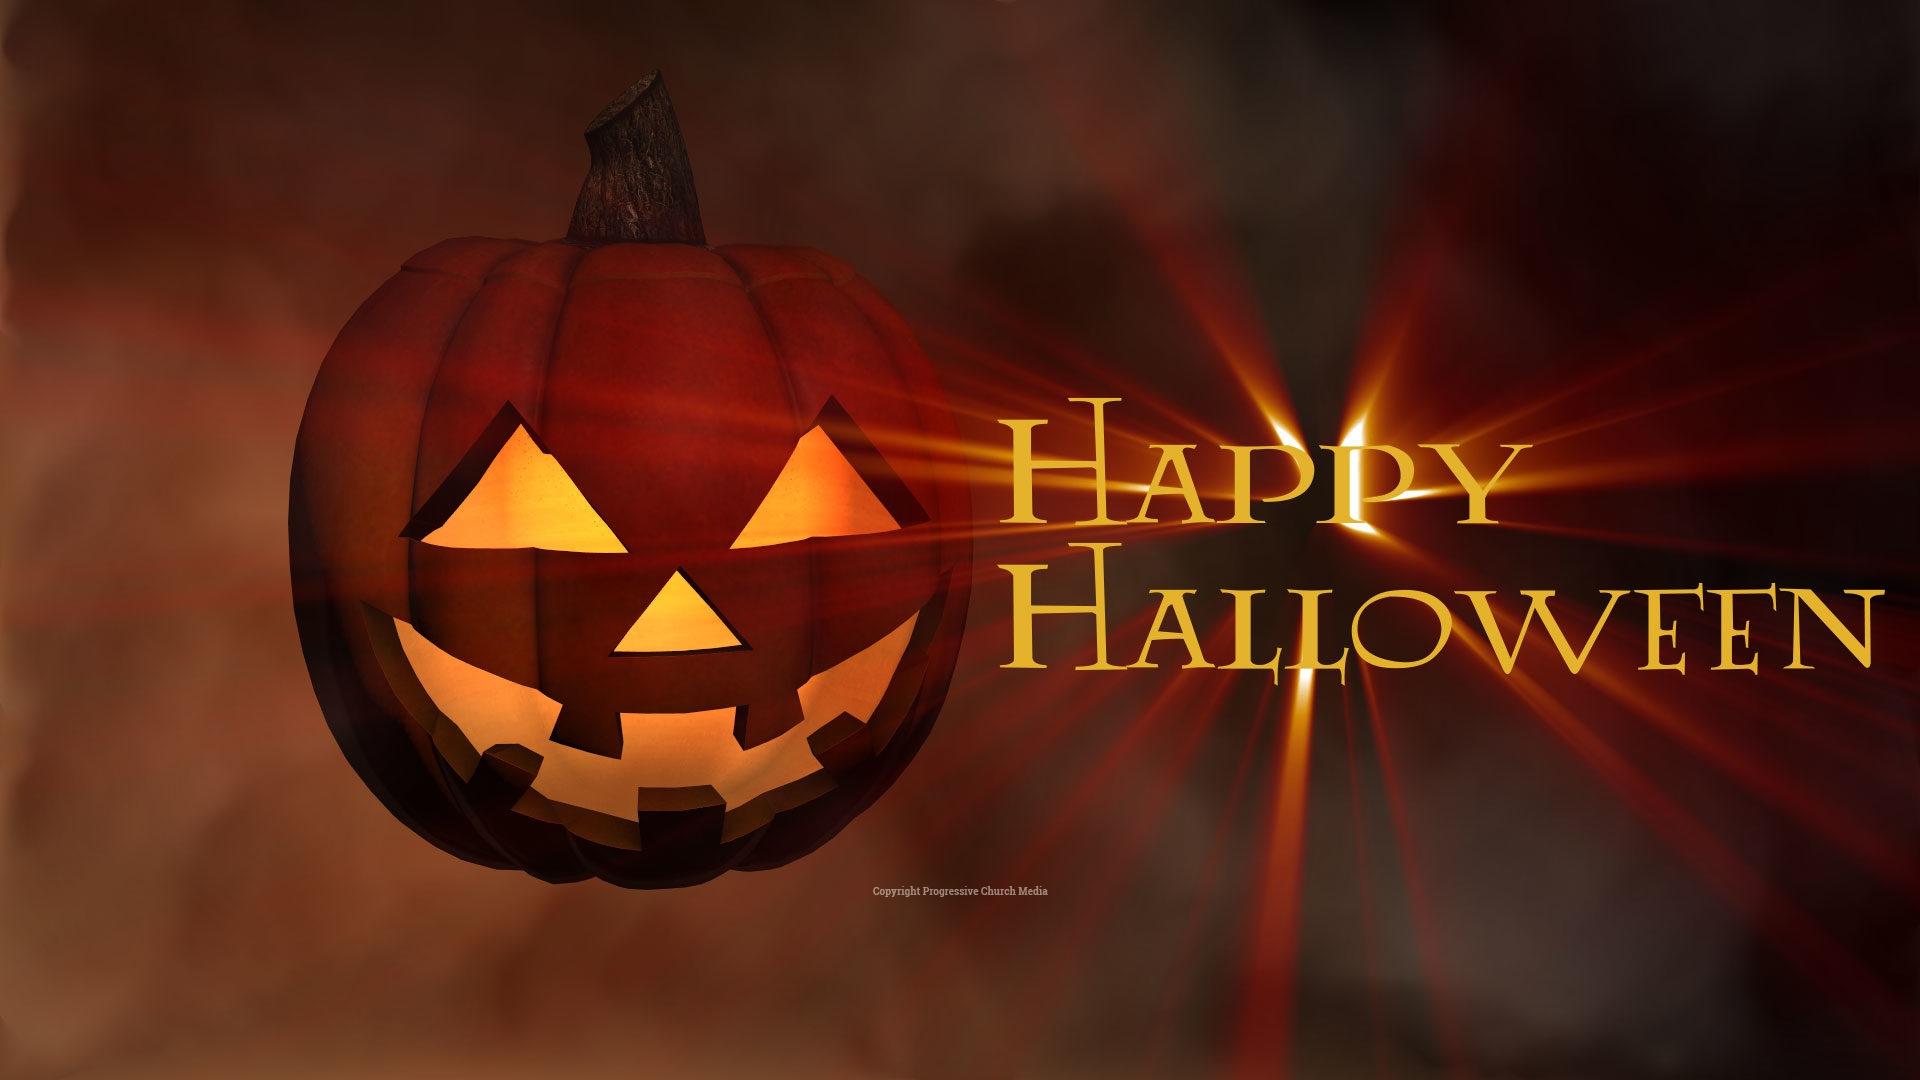 Halloween Pumpkin Video Progressive Church Media